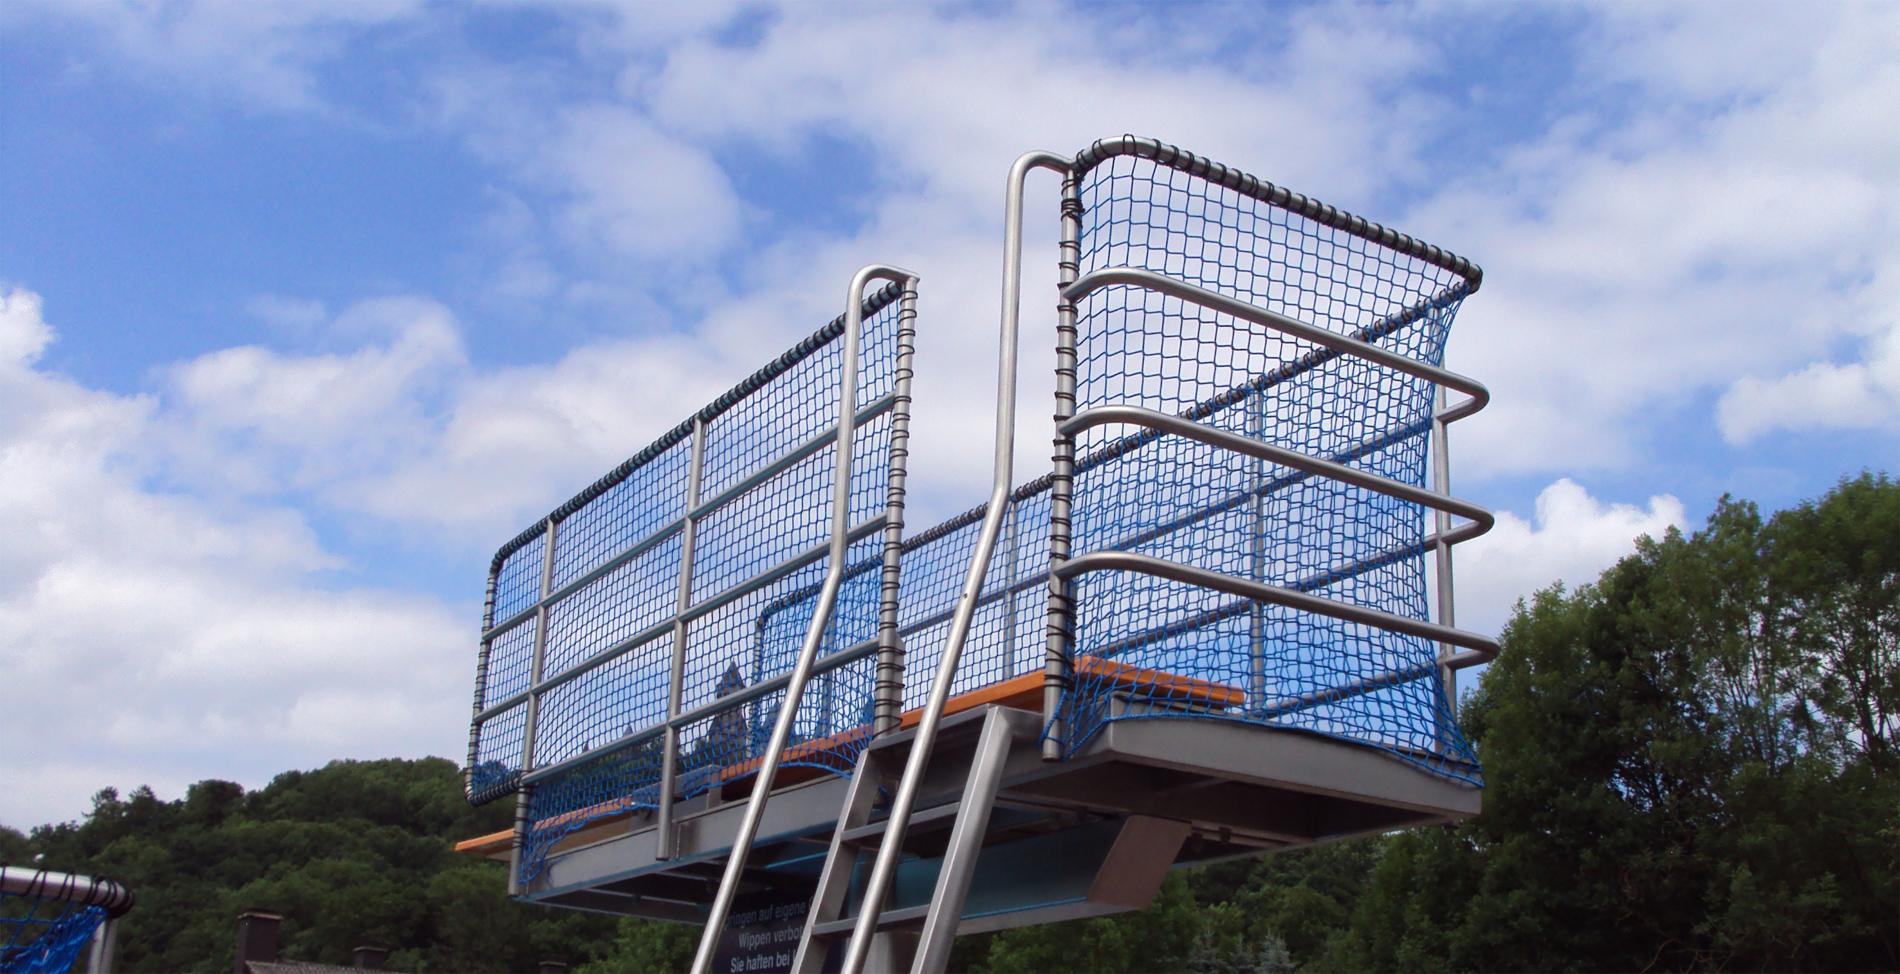 Sonderlösung Schwimmbad Springturm